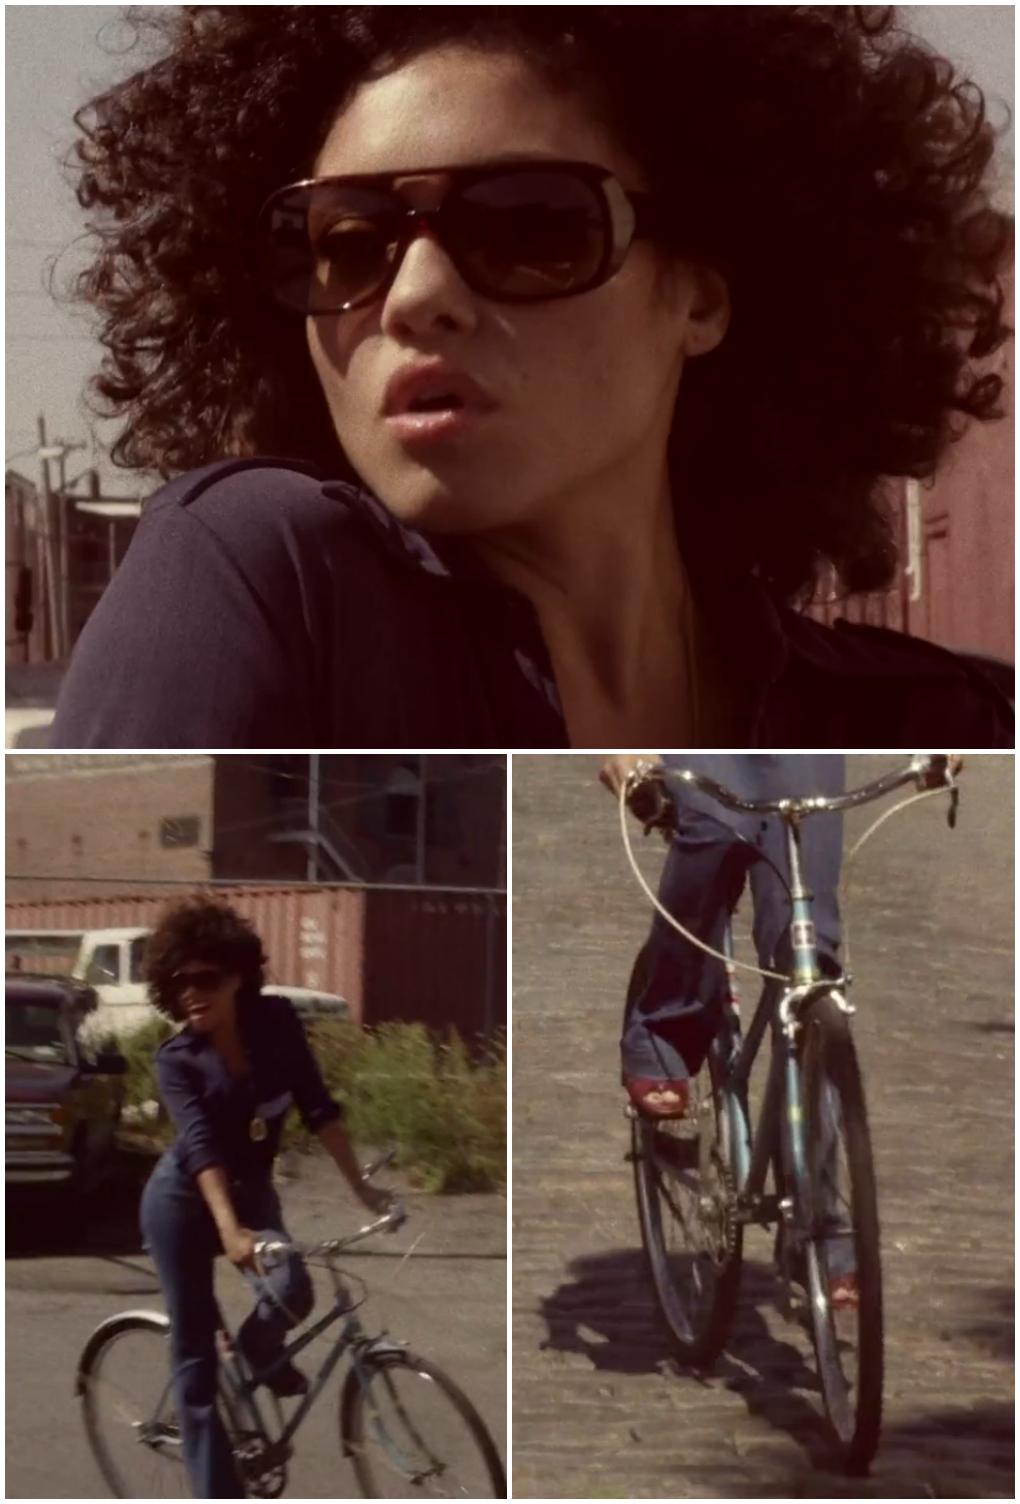 vintage style, flare jeans, Seafarer, Colette, bell bottom, denim, Garance Dore, navy, dungarees, brooklyn, vintage bike, bicycle, afro, cute girl, girl on bike, model on bike, seventies